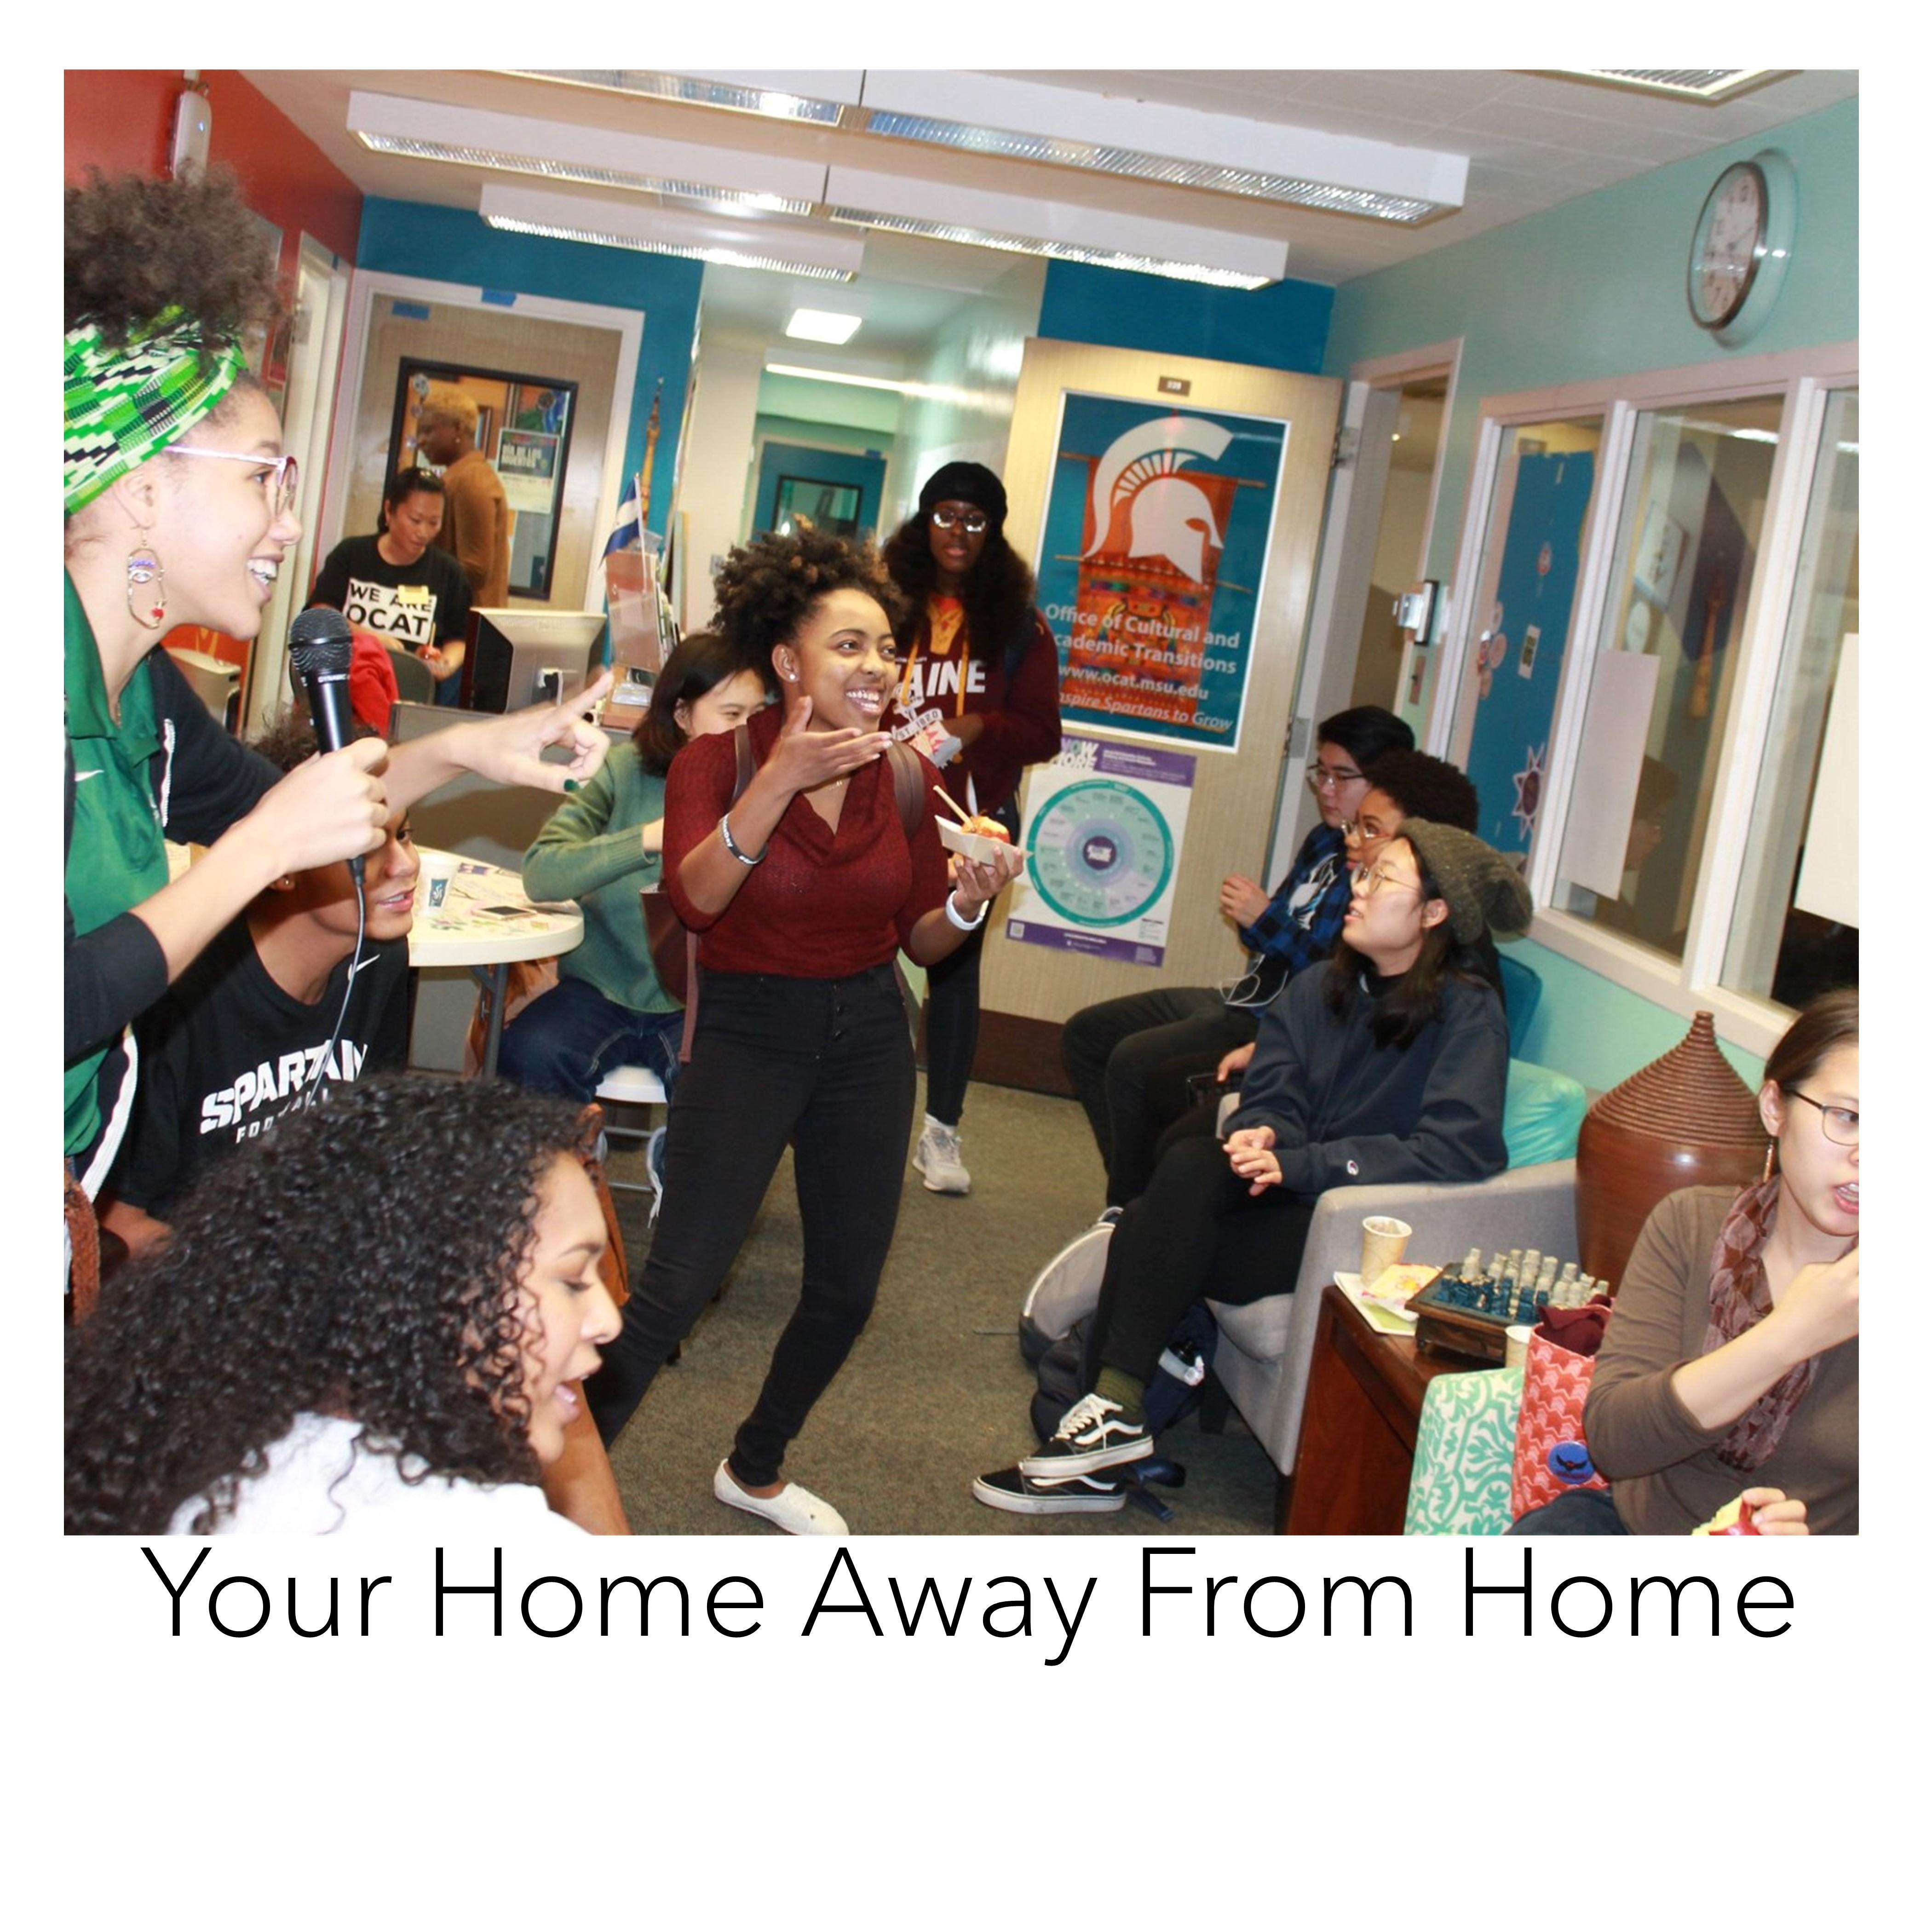 http://ocat.msu.edu/wp-content/uploads/2020/07/Your-Home-Away-From-Home.jpg